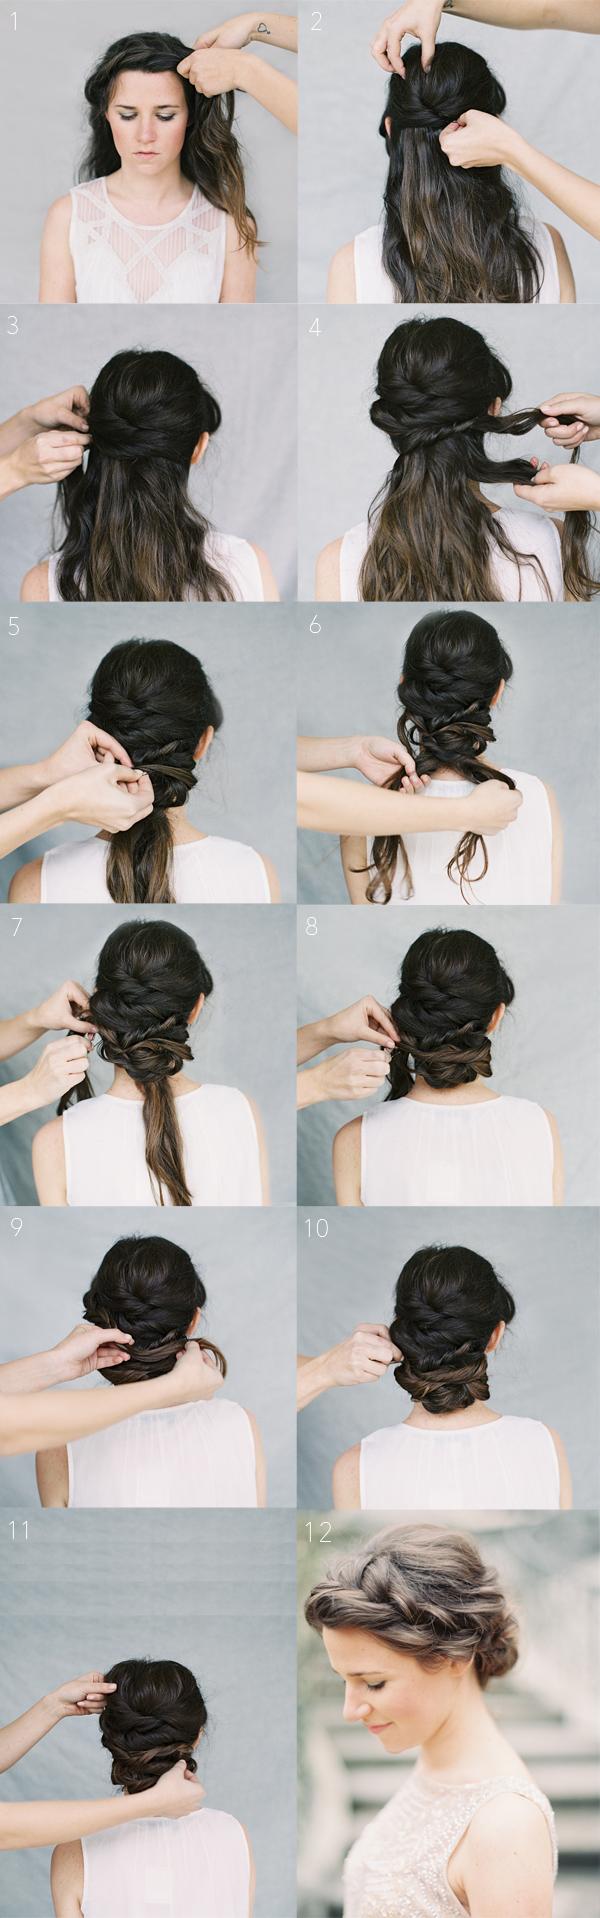 Crown braid wedding hairstyles for long hair braid wedding